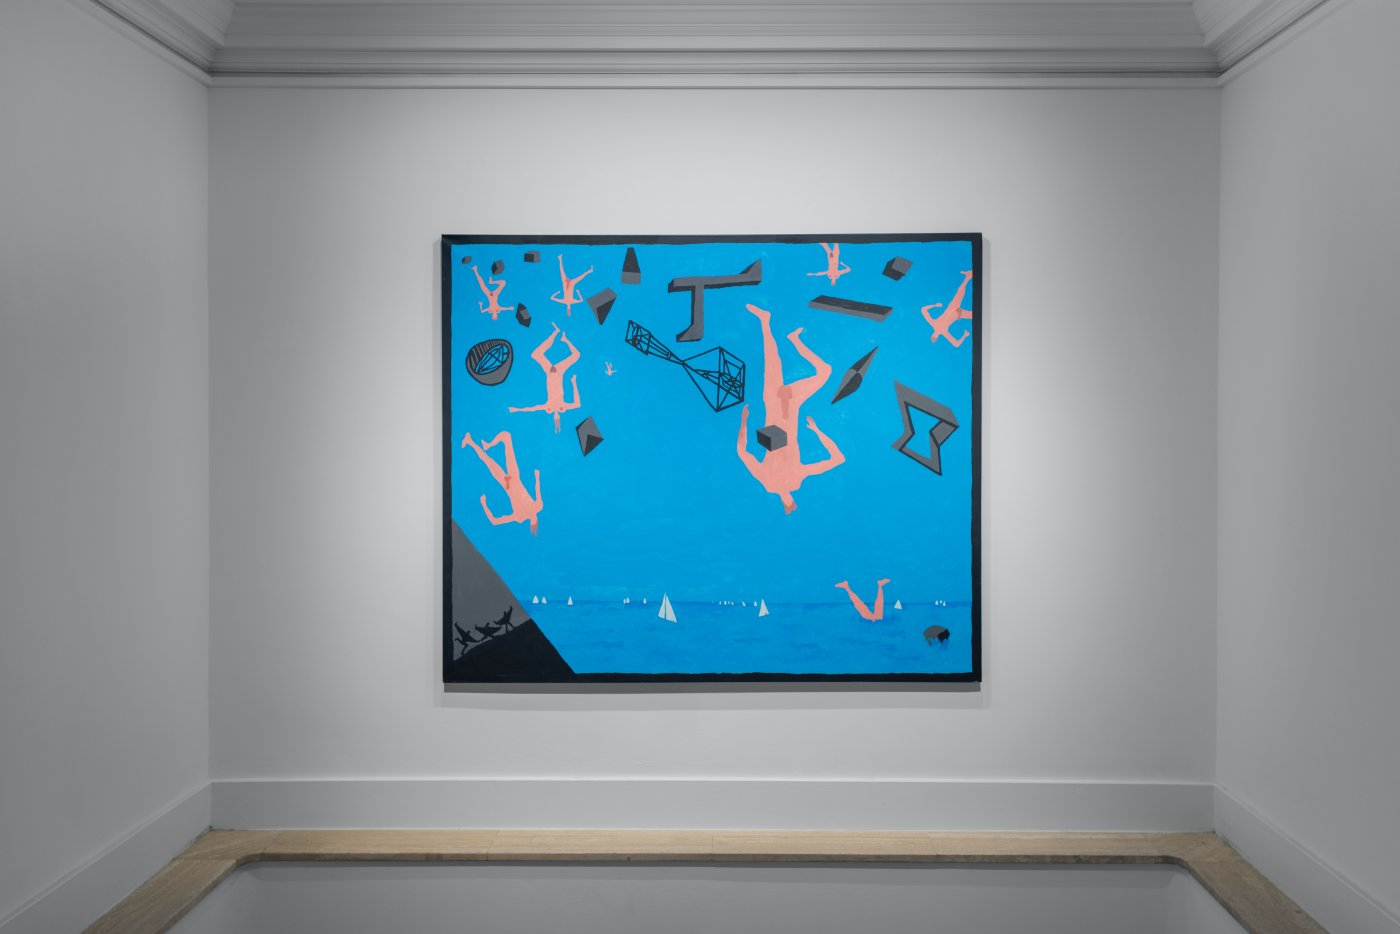 Gazelli Art House Derek Boshier 2